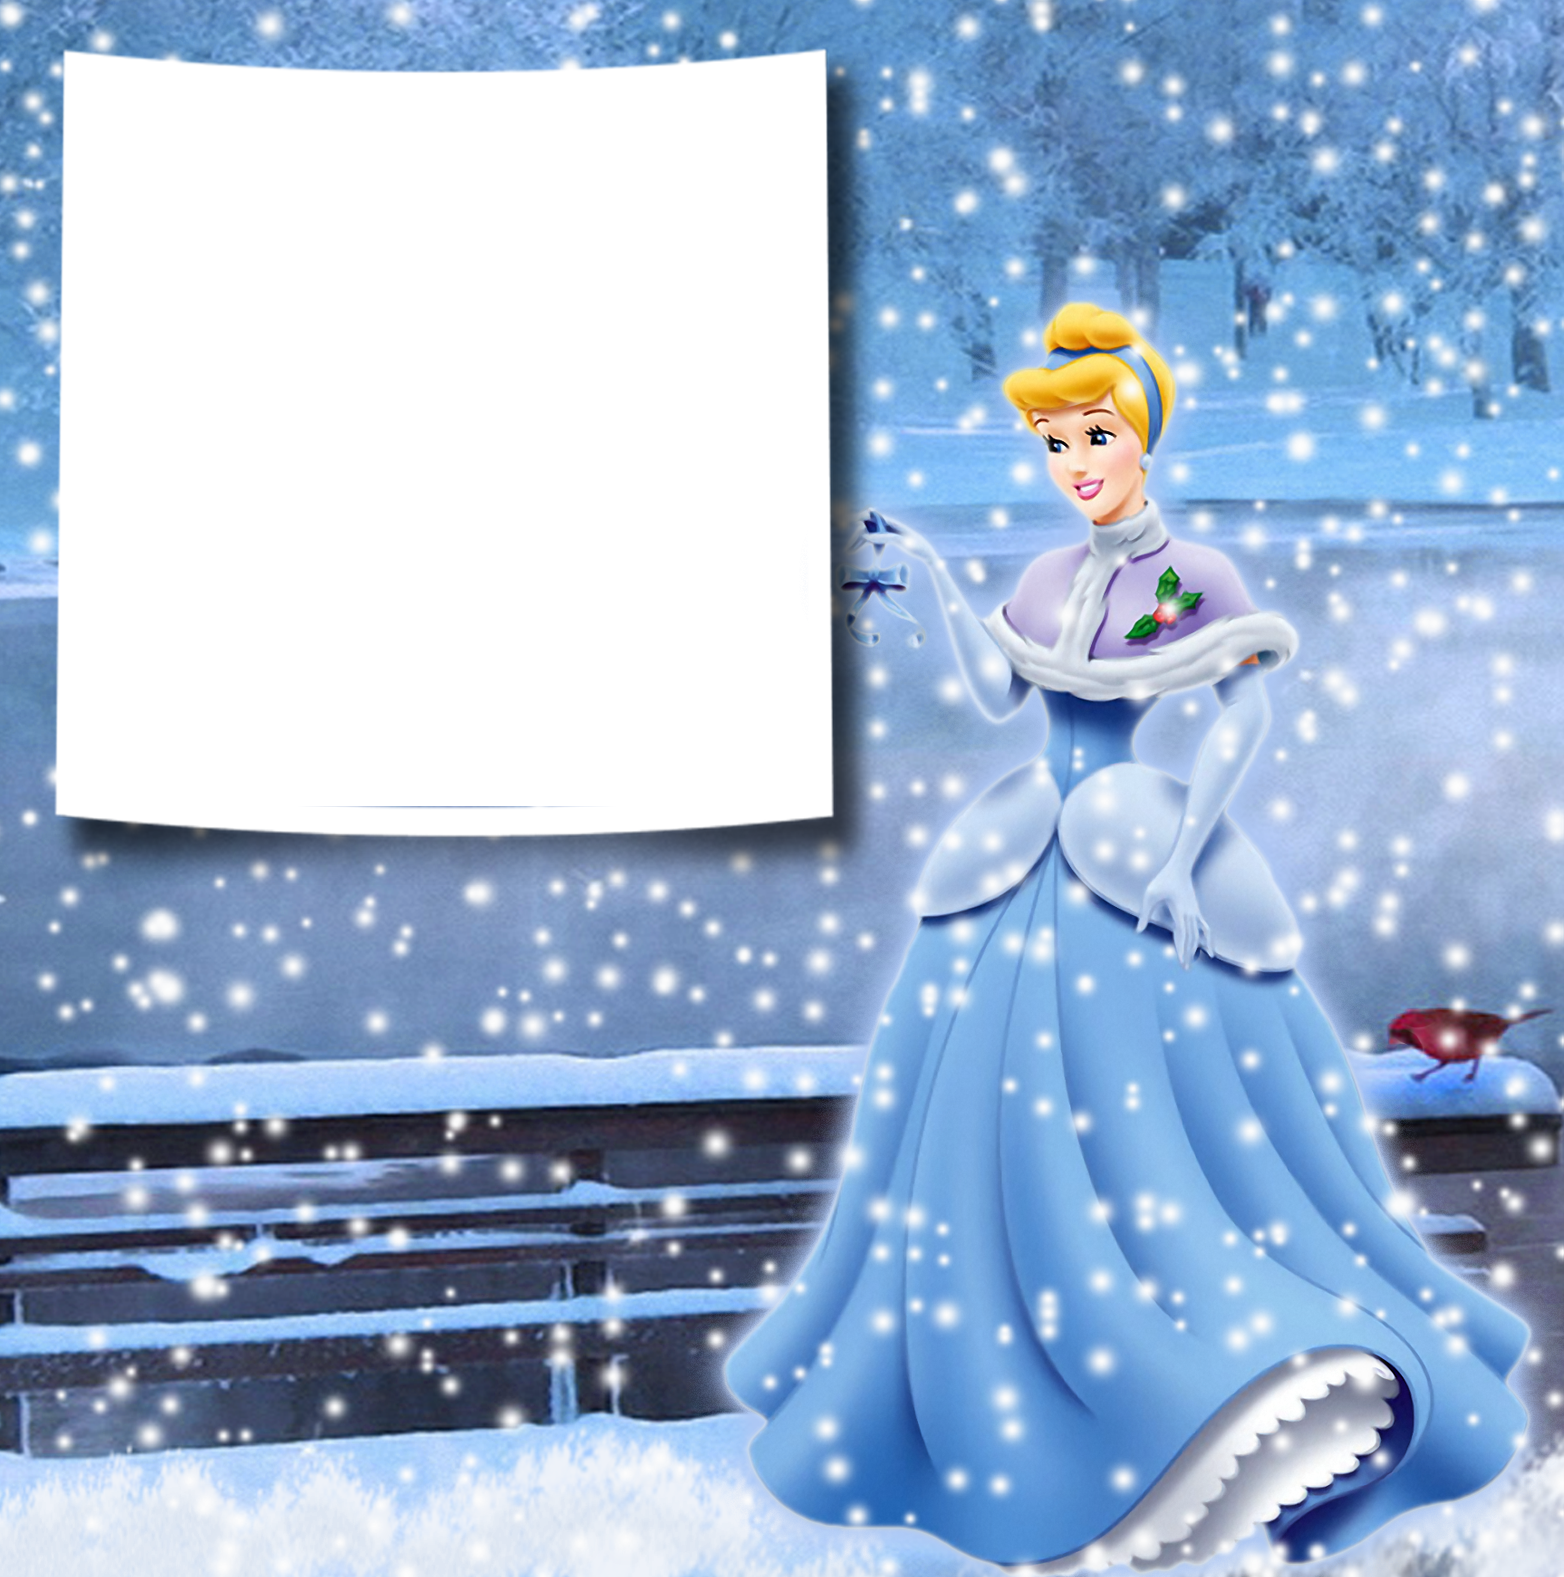 Pin By Tatjana Niinas On Raamistik Winter Princess